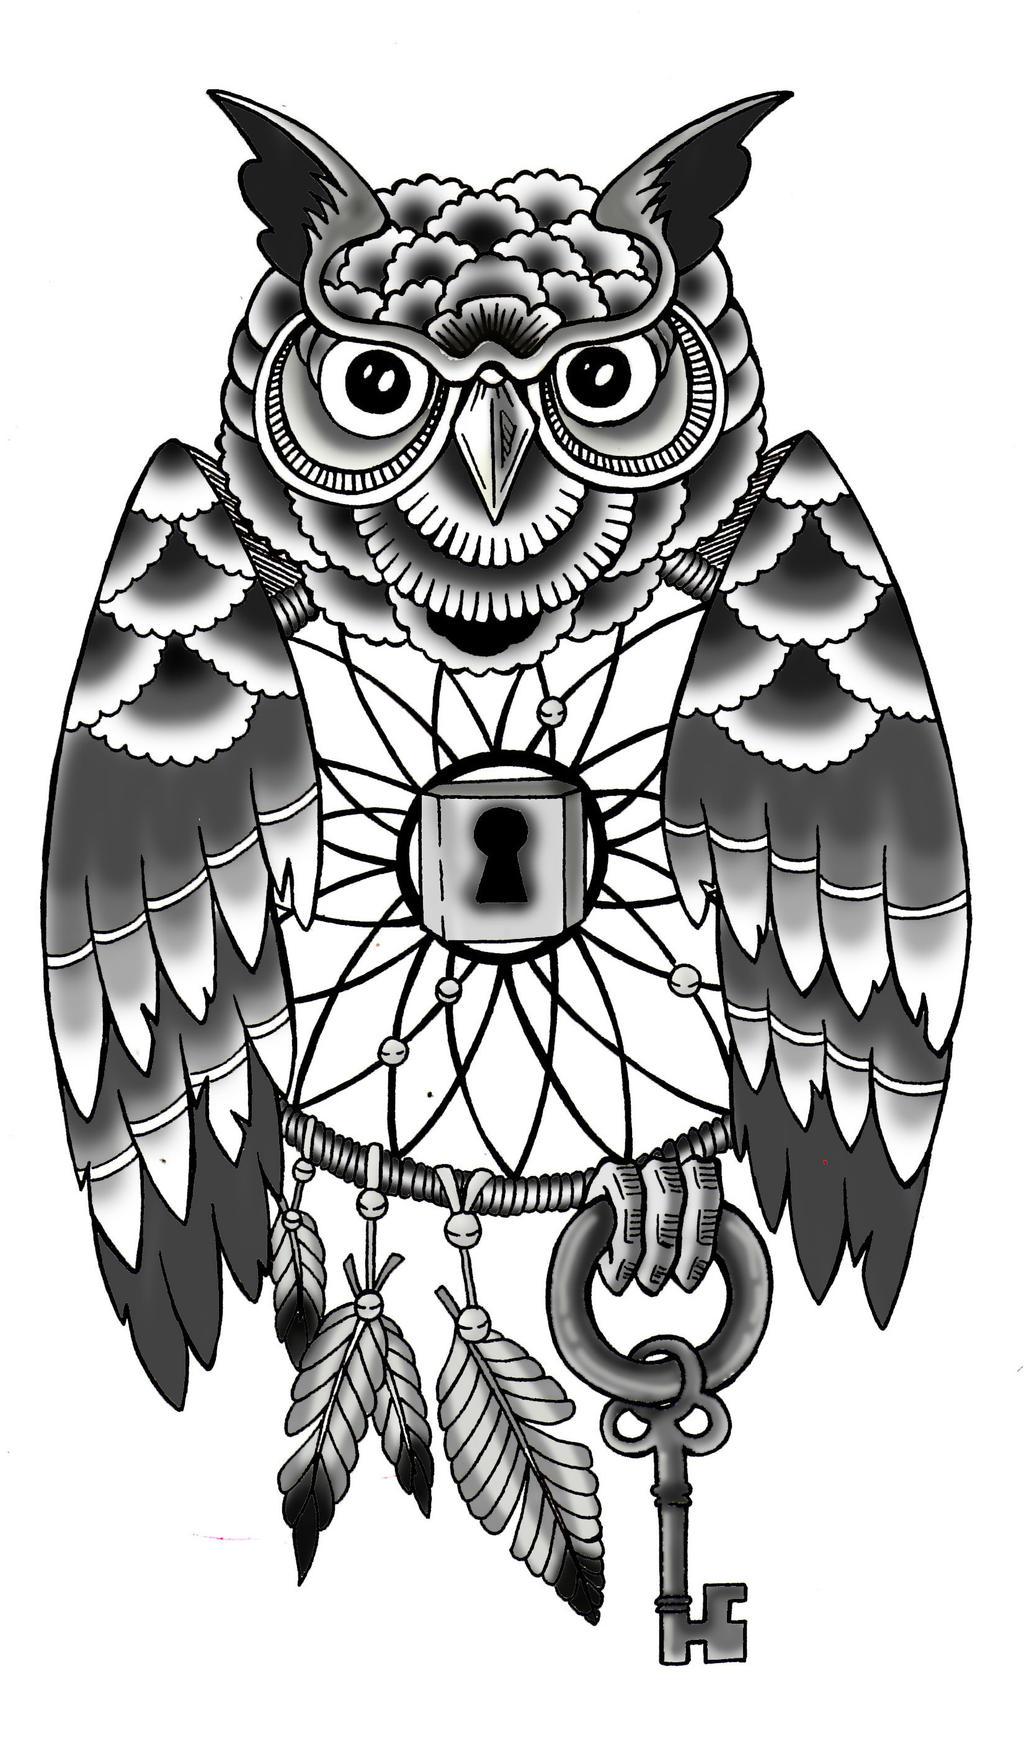 Owl dreamcatcher drawing - photo#25